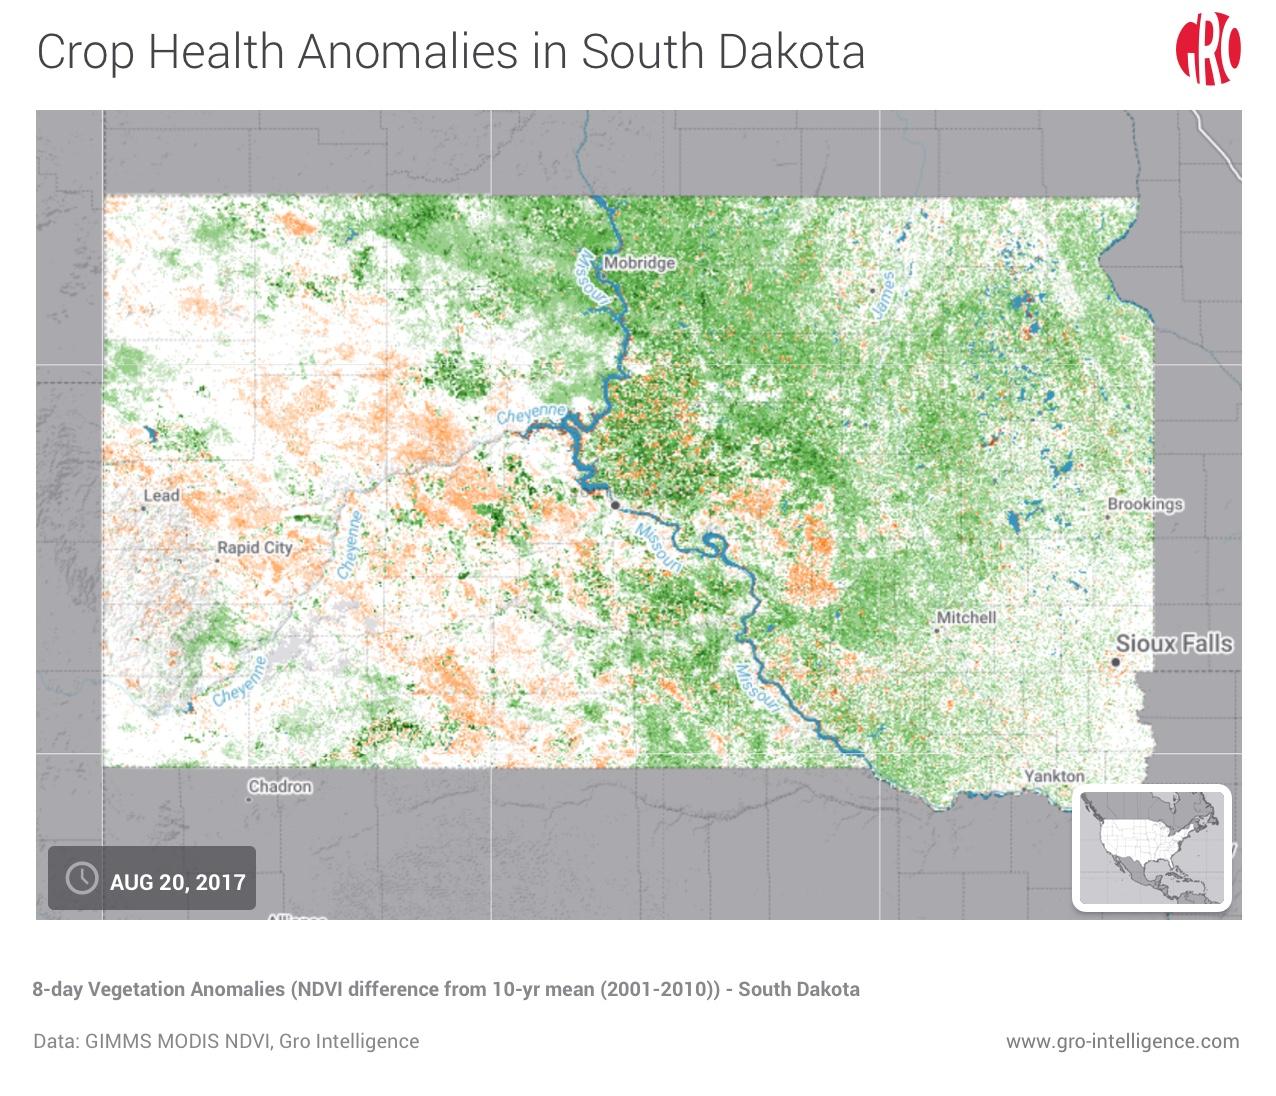 Crop Health Anomalies in South Dakota